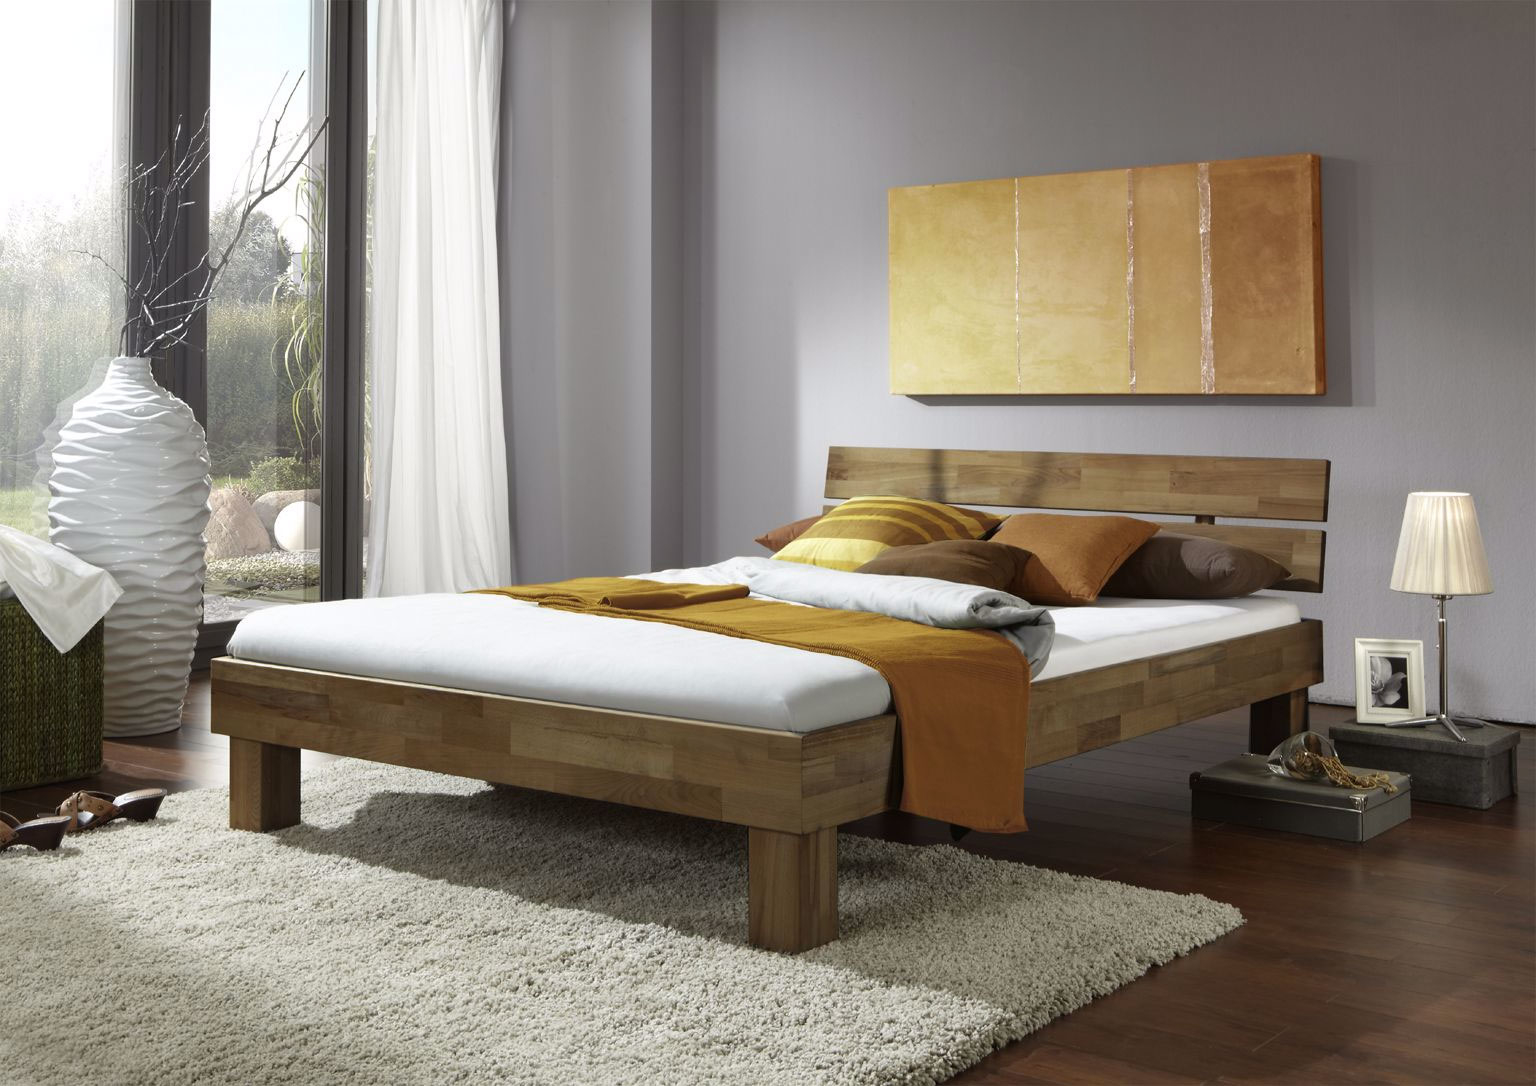 Full Size of Bett 100x200 Weiß Betten Wohnzimmer Futonbett 100x200